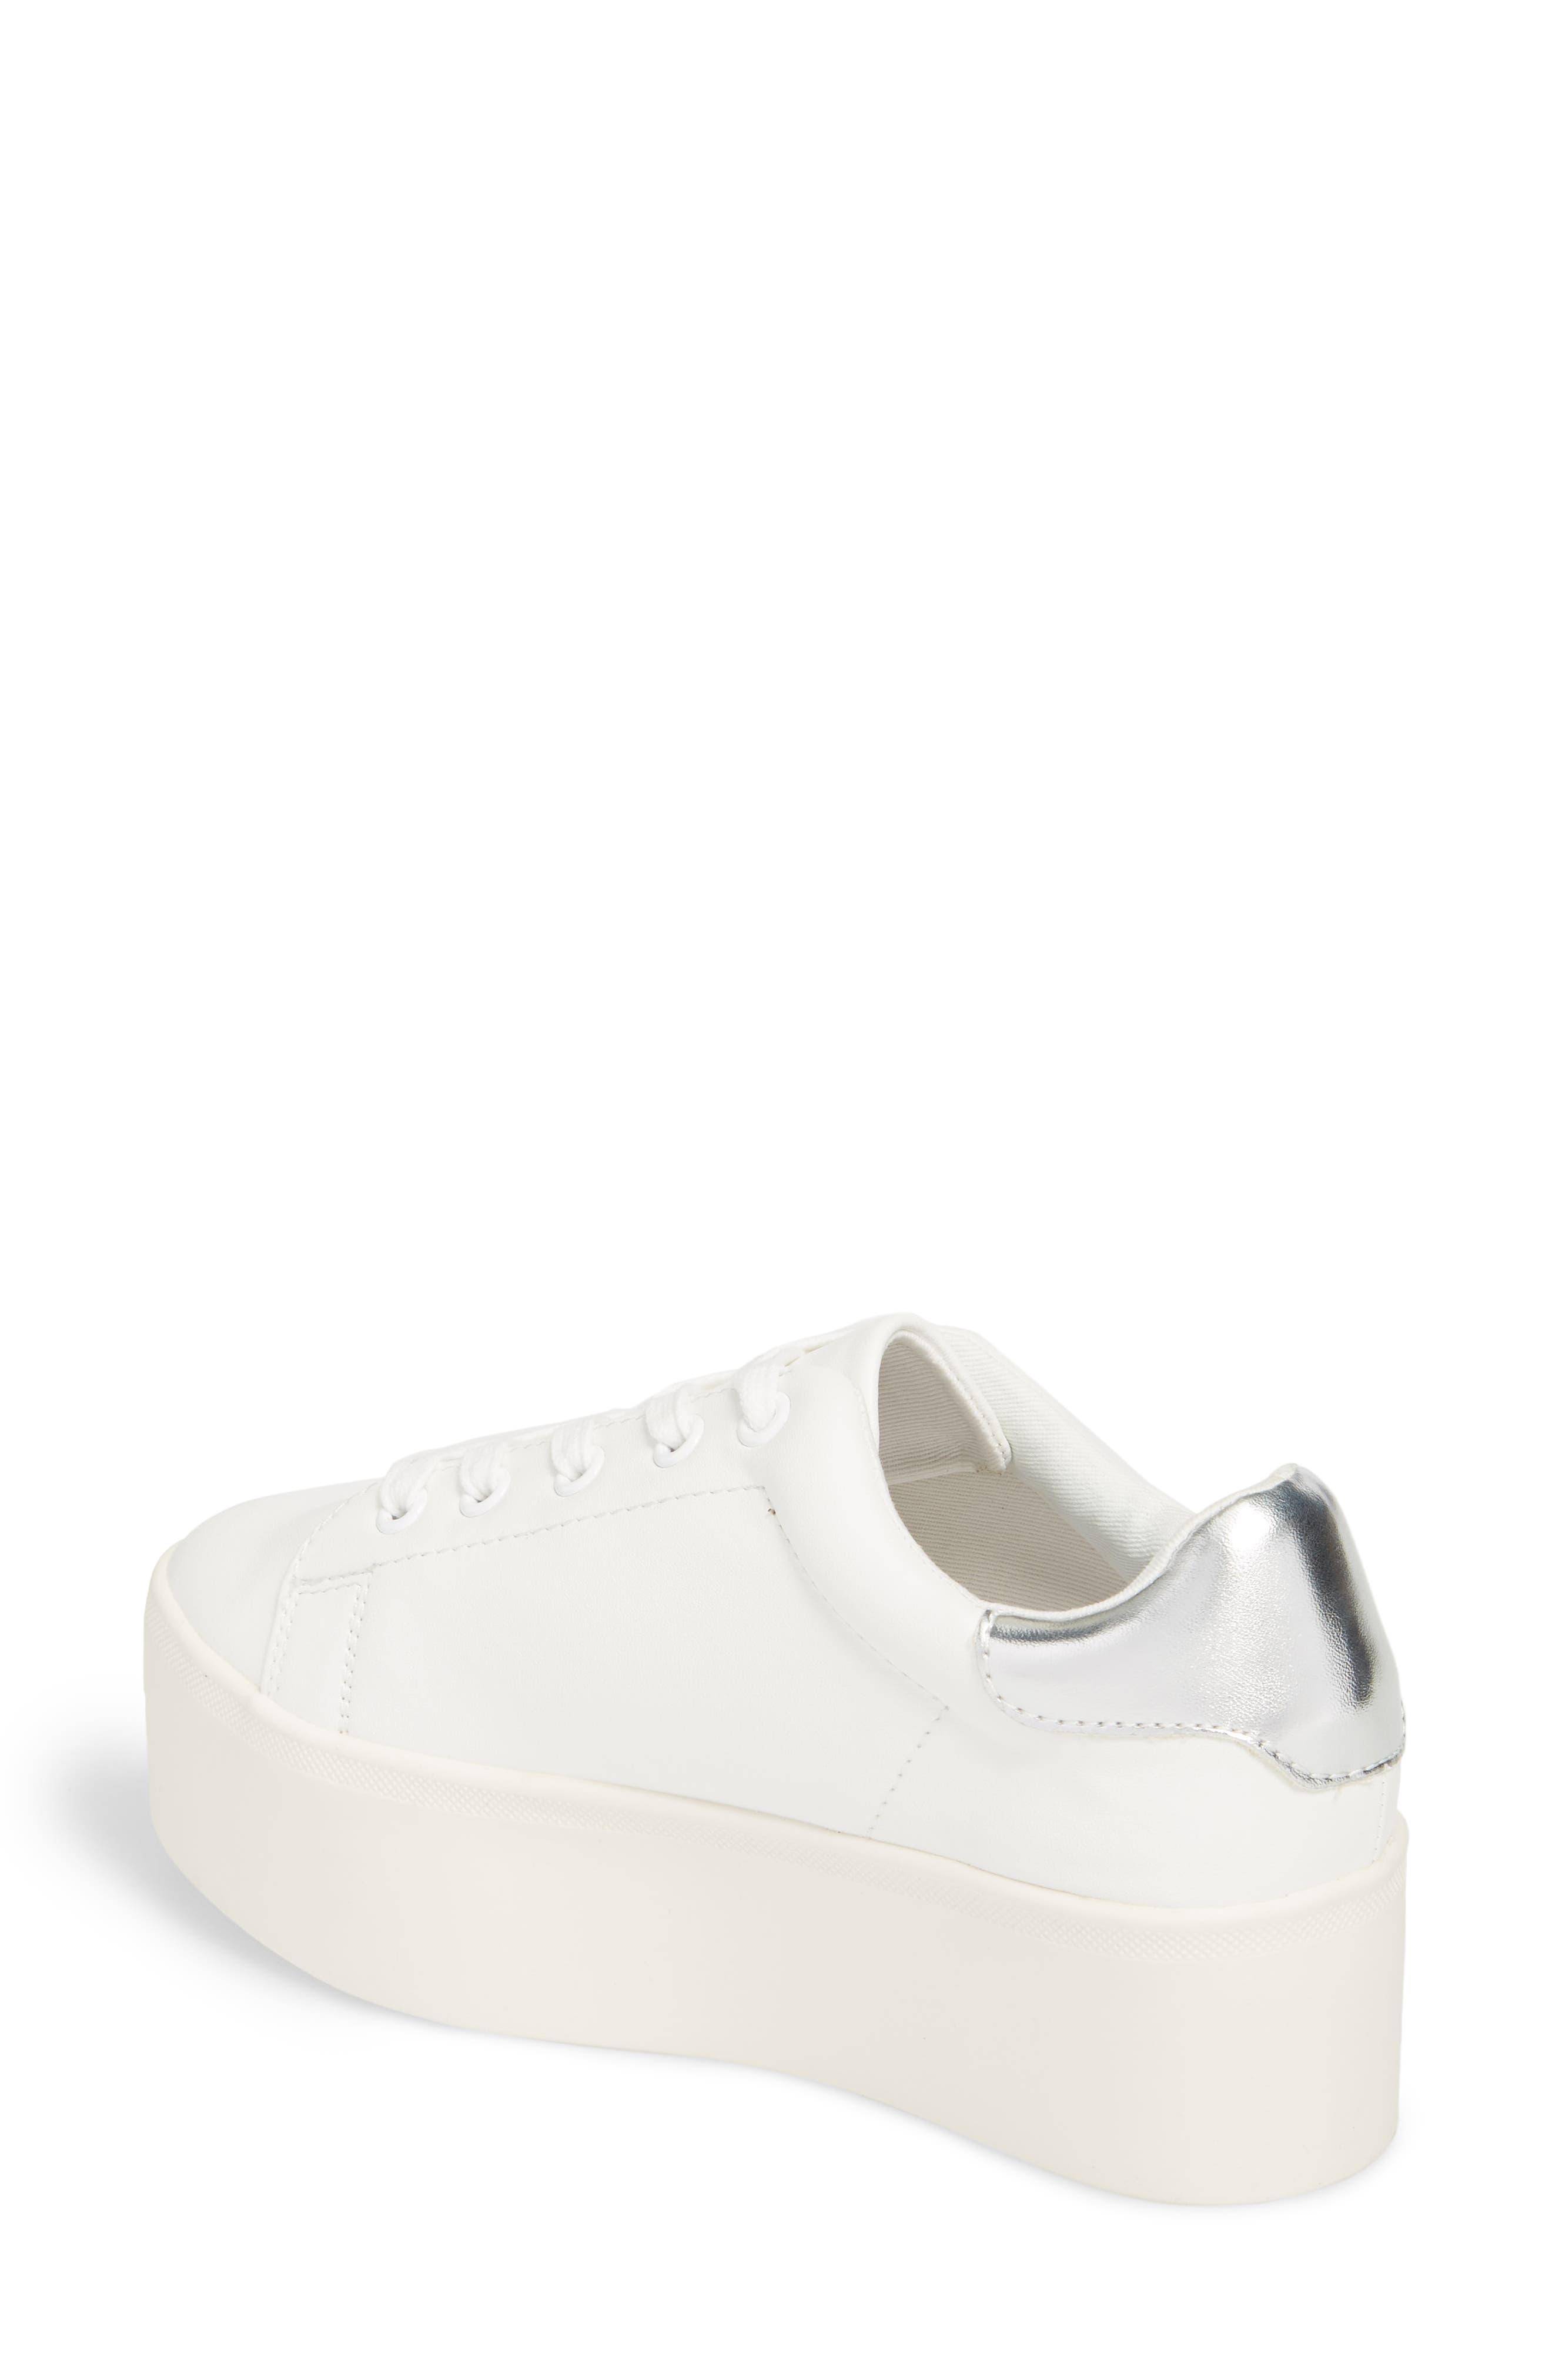 Palmer Sneaker,                             Alternate thumbnail 2, color,                             100